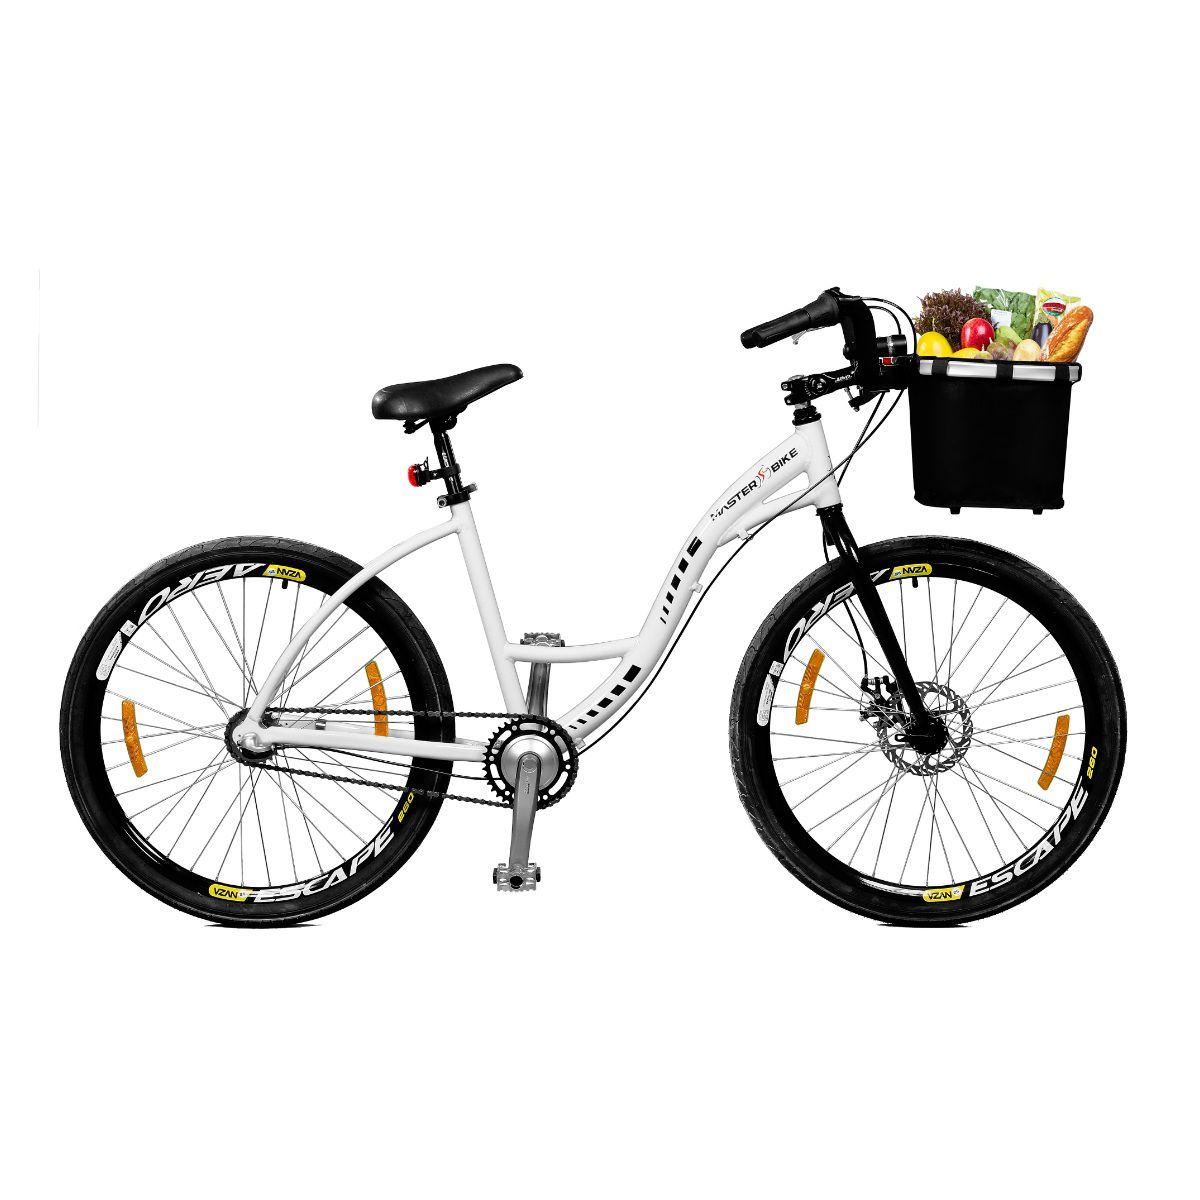 Bicicleta Master Bike Aro 26 Urbis Freio à Disco 3 V Nexus c/ Cesta Branco